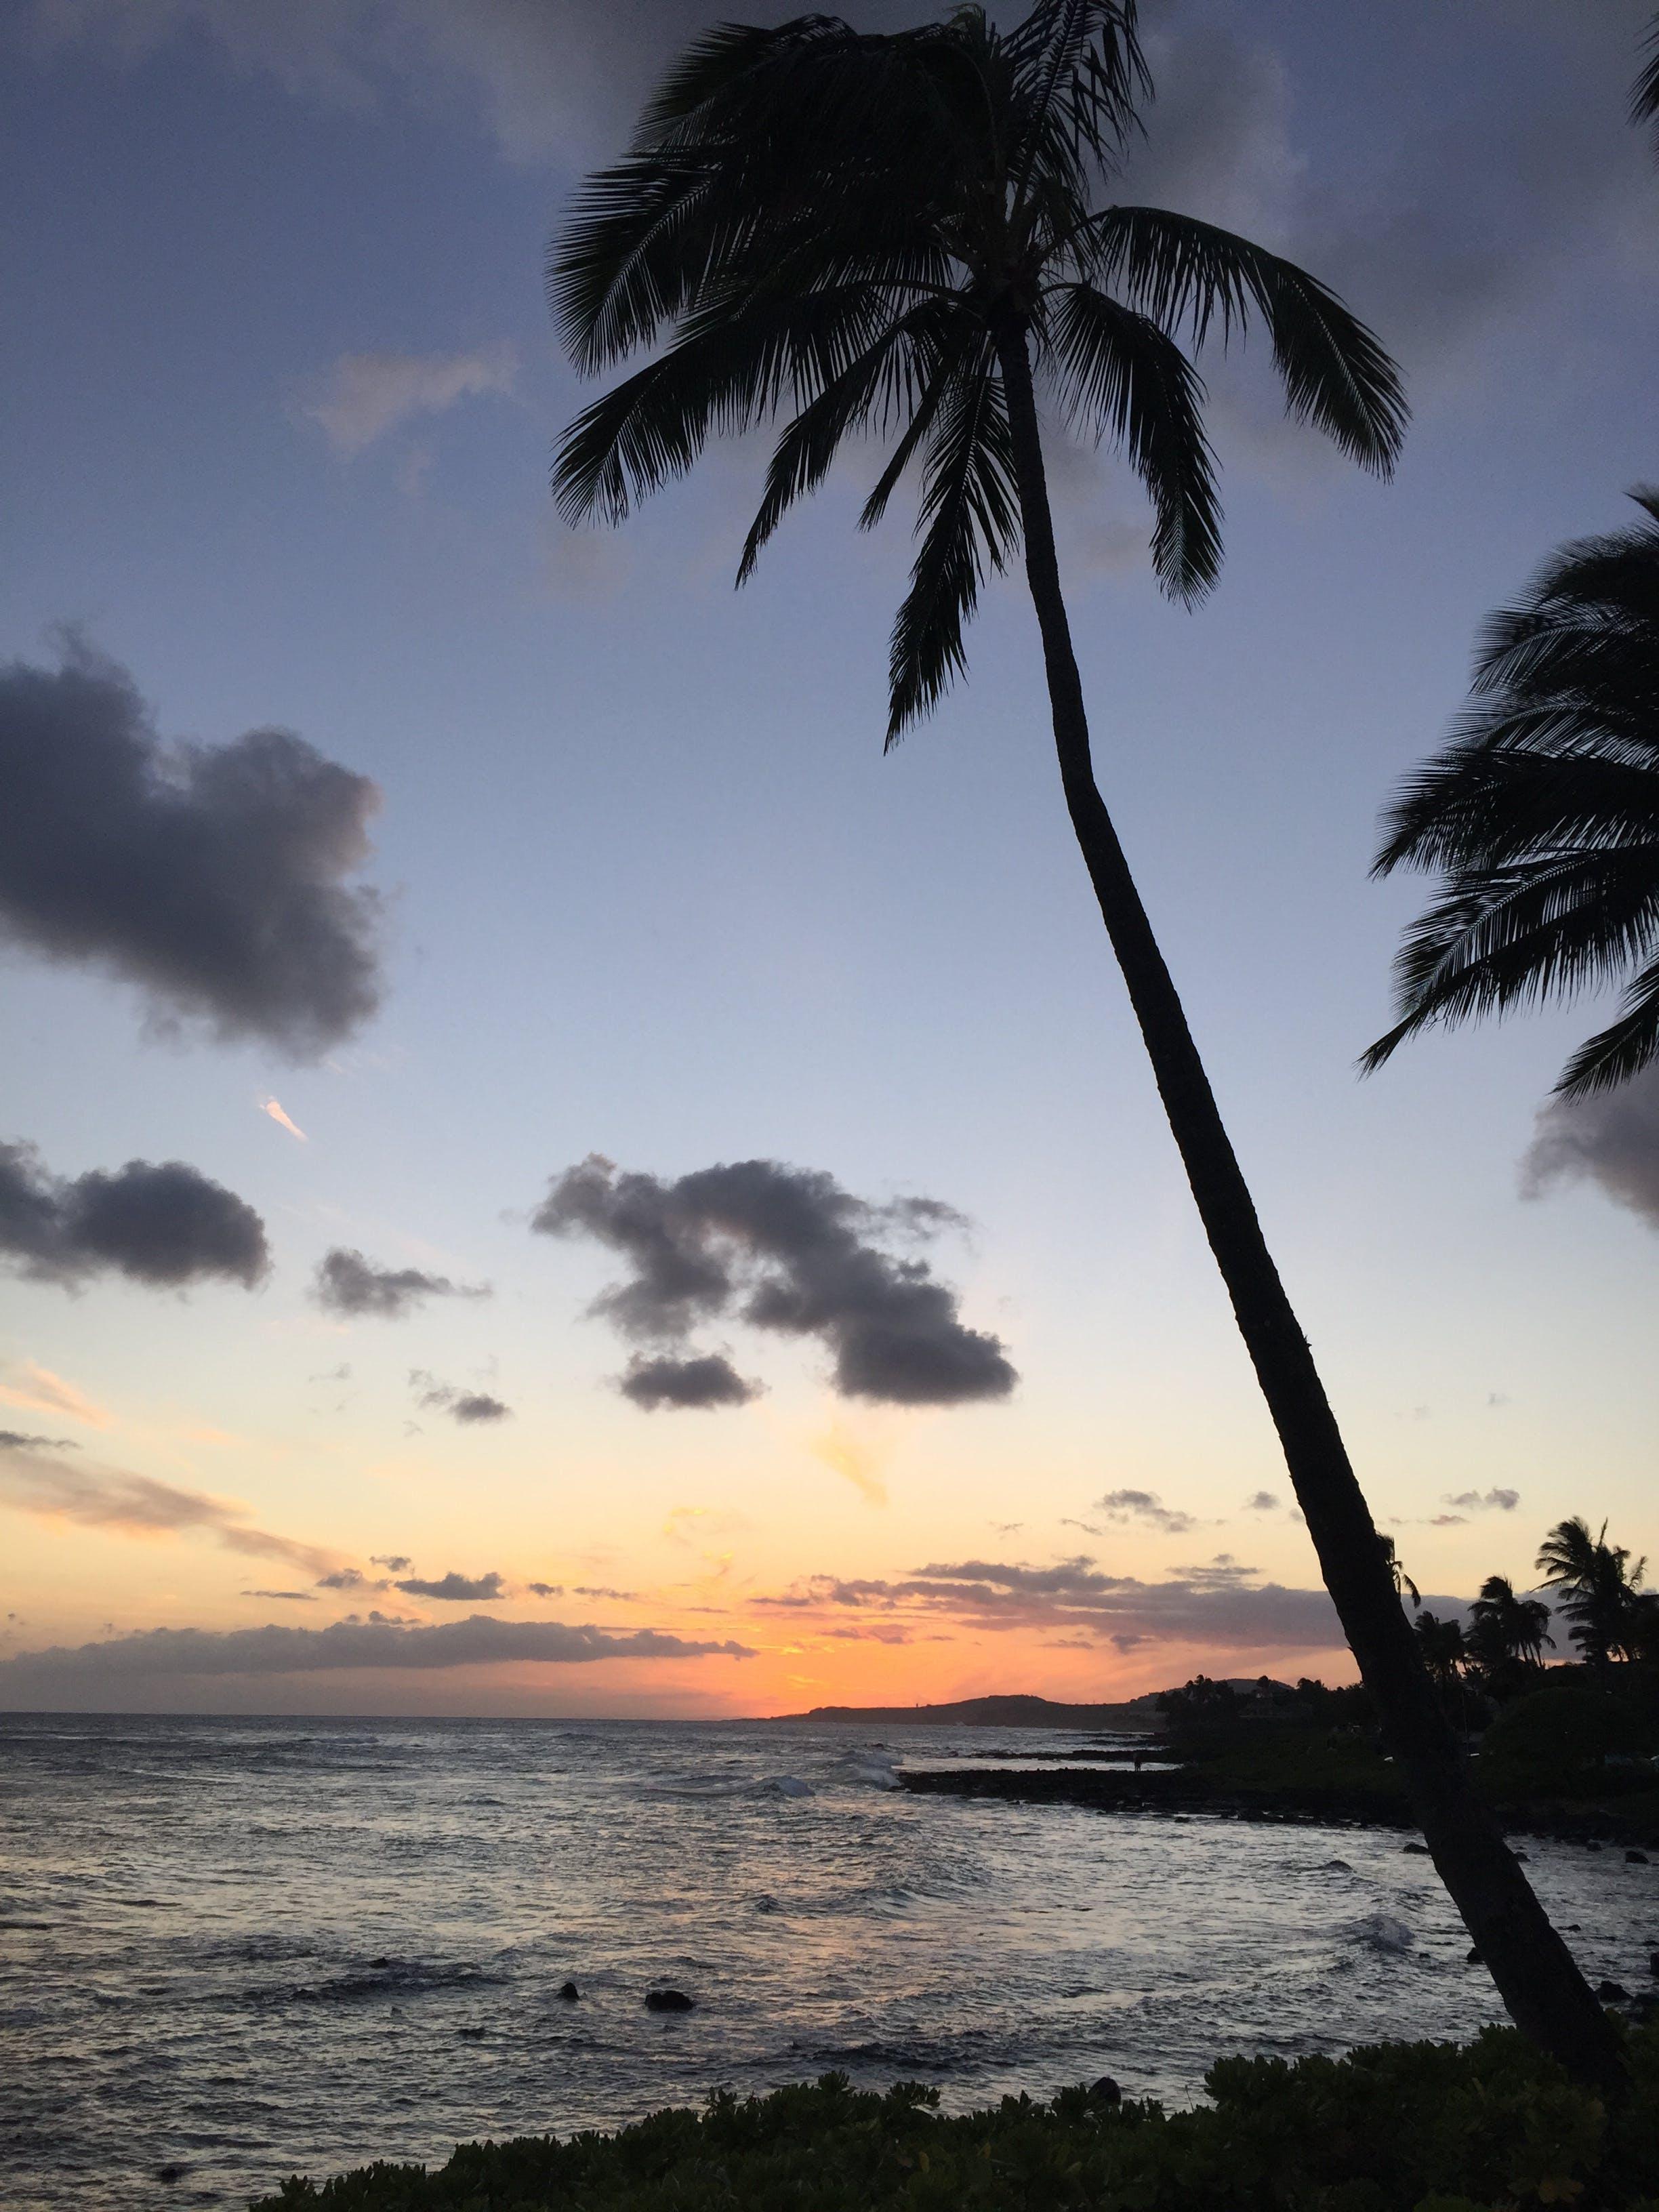 Coconut Palm Tree Near Ocean during Sunrise